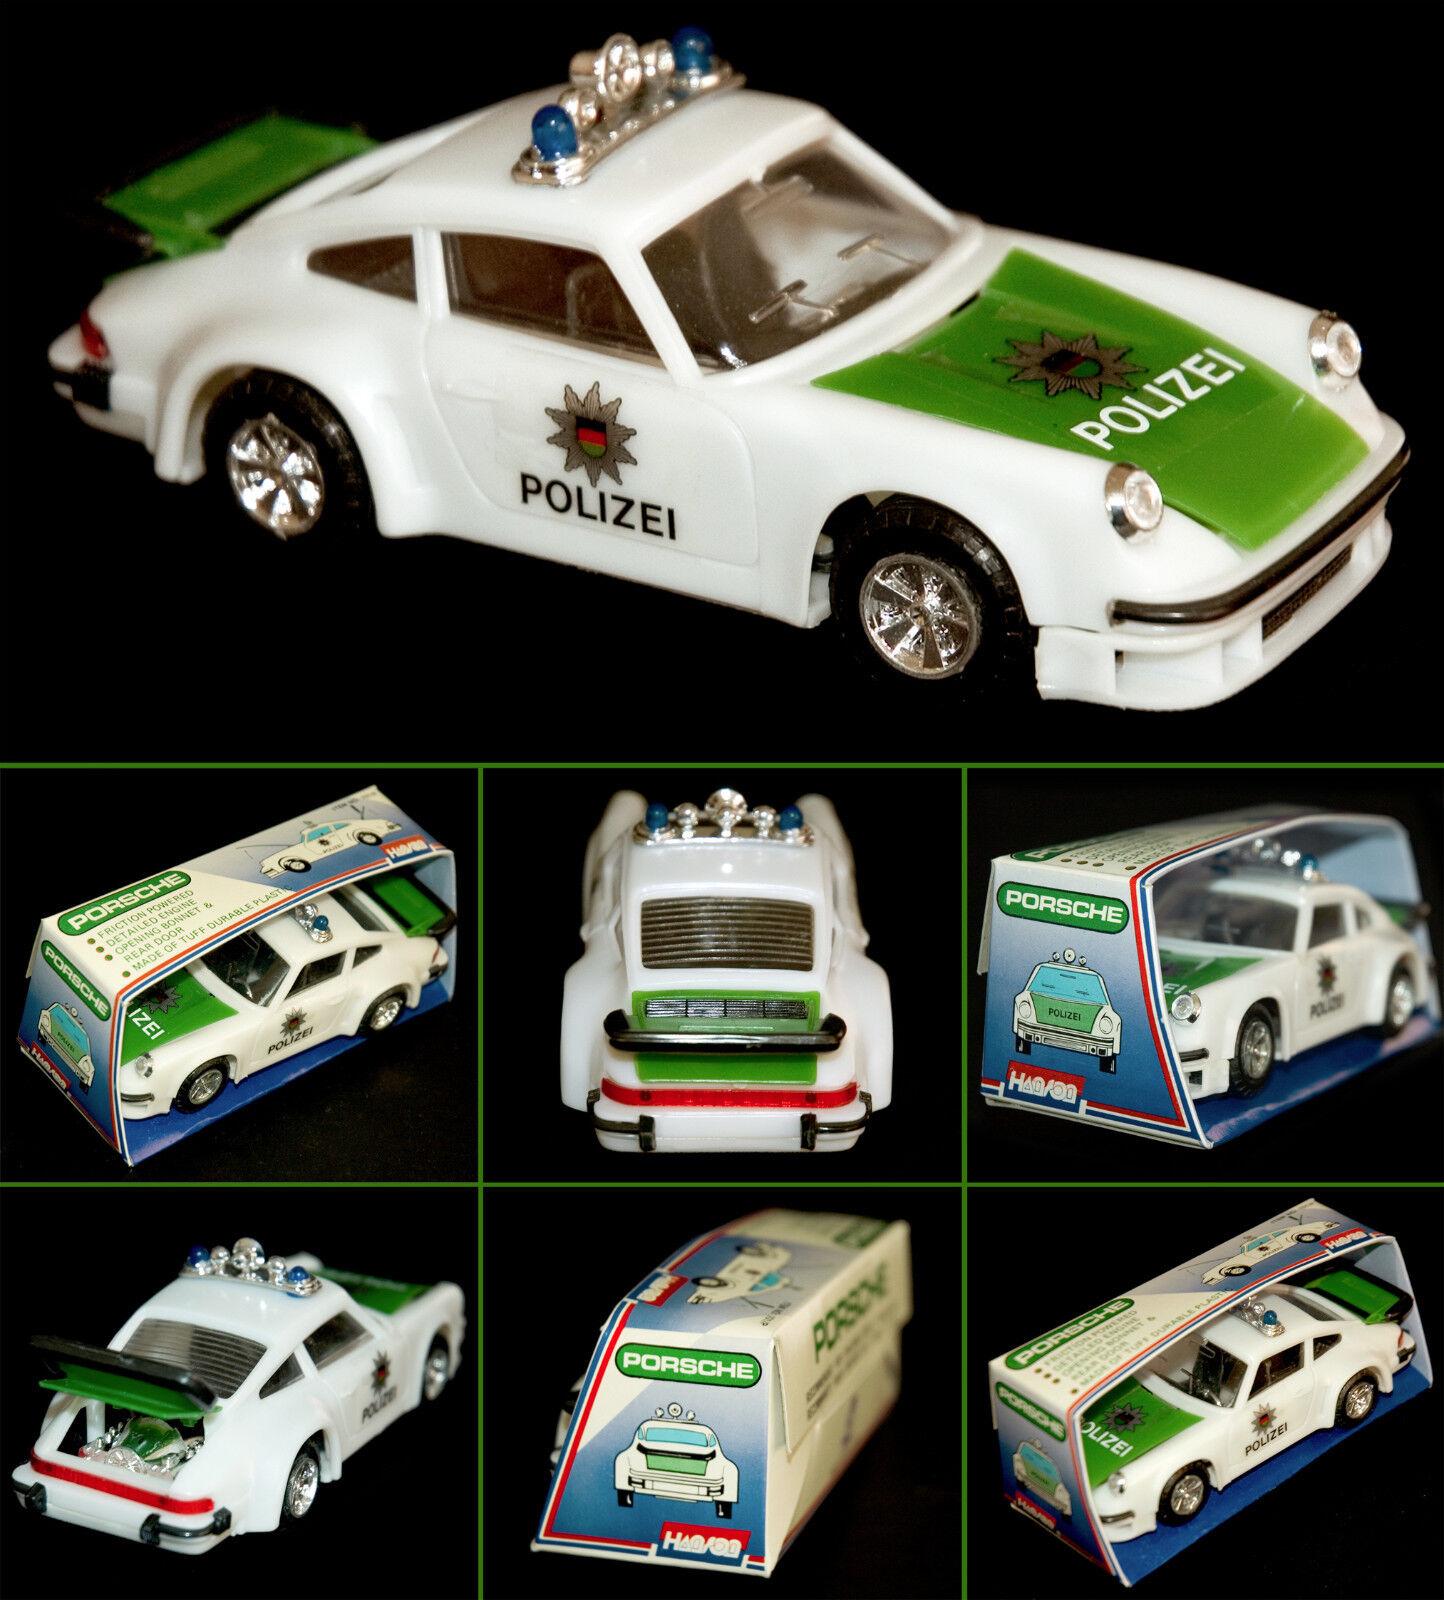 PORSCHE 911 CARRERA DEUTSCHE POLIZEI OVP HANSON HONG KONG 15 CM 70s FRICTION